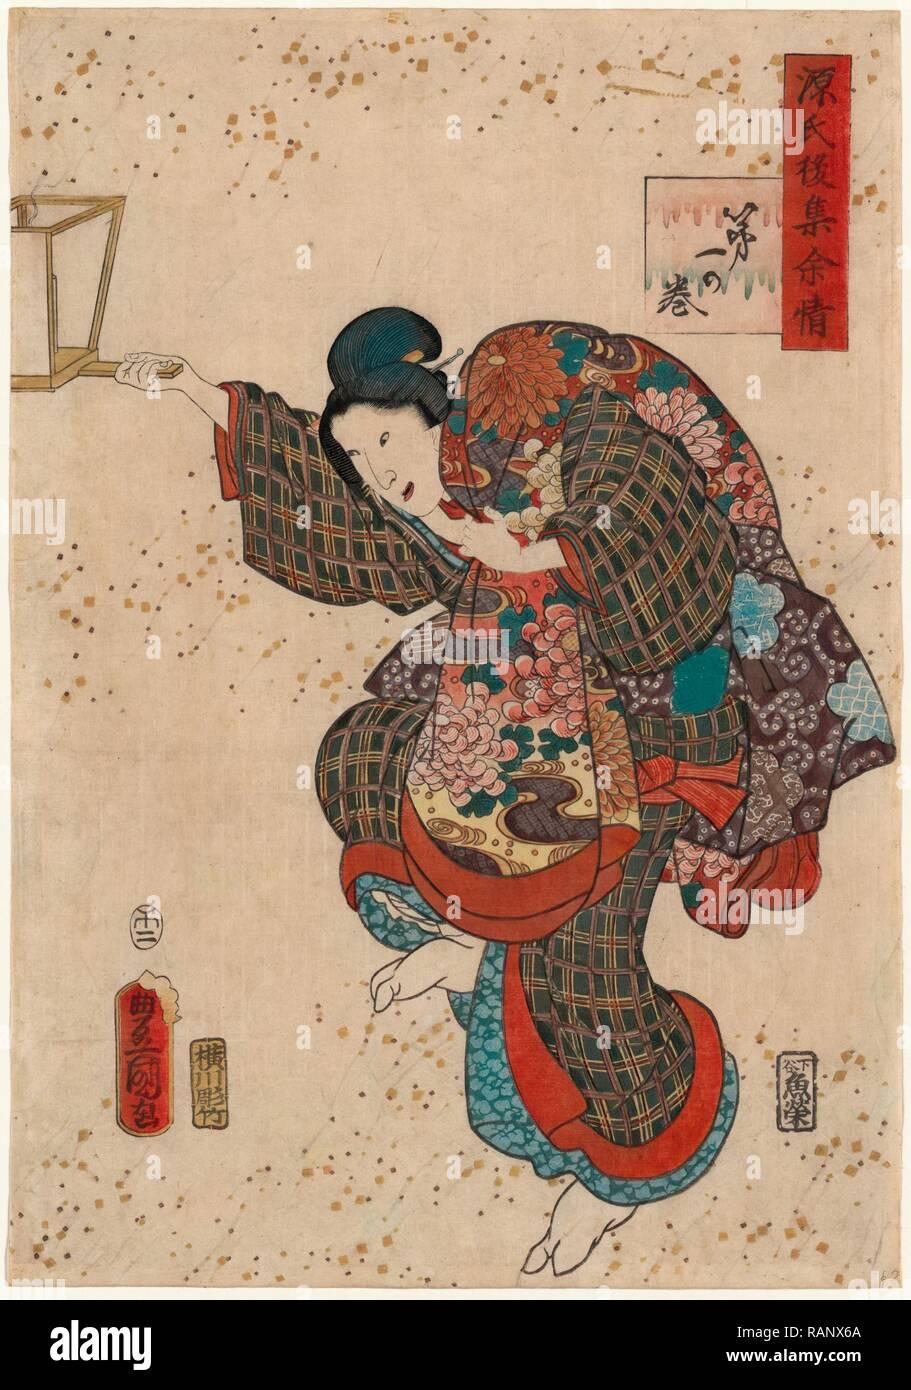 Daiichi No Maki, Utagawa Toyokuni, 1786-1865. Reimagined by Gibon. Classic art with a modern twist reimagined - Stock Image